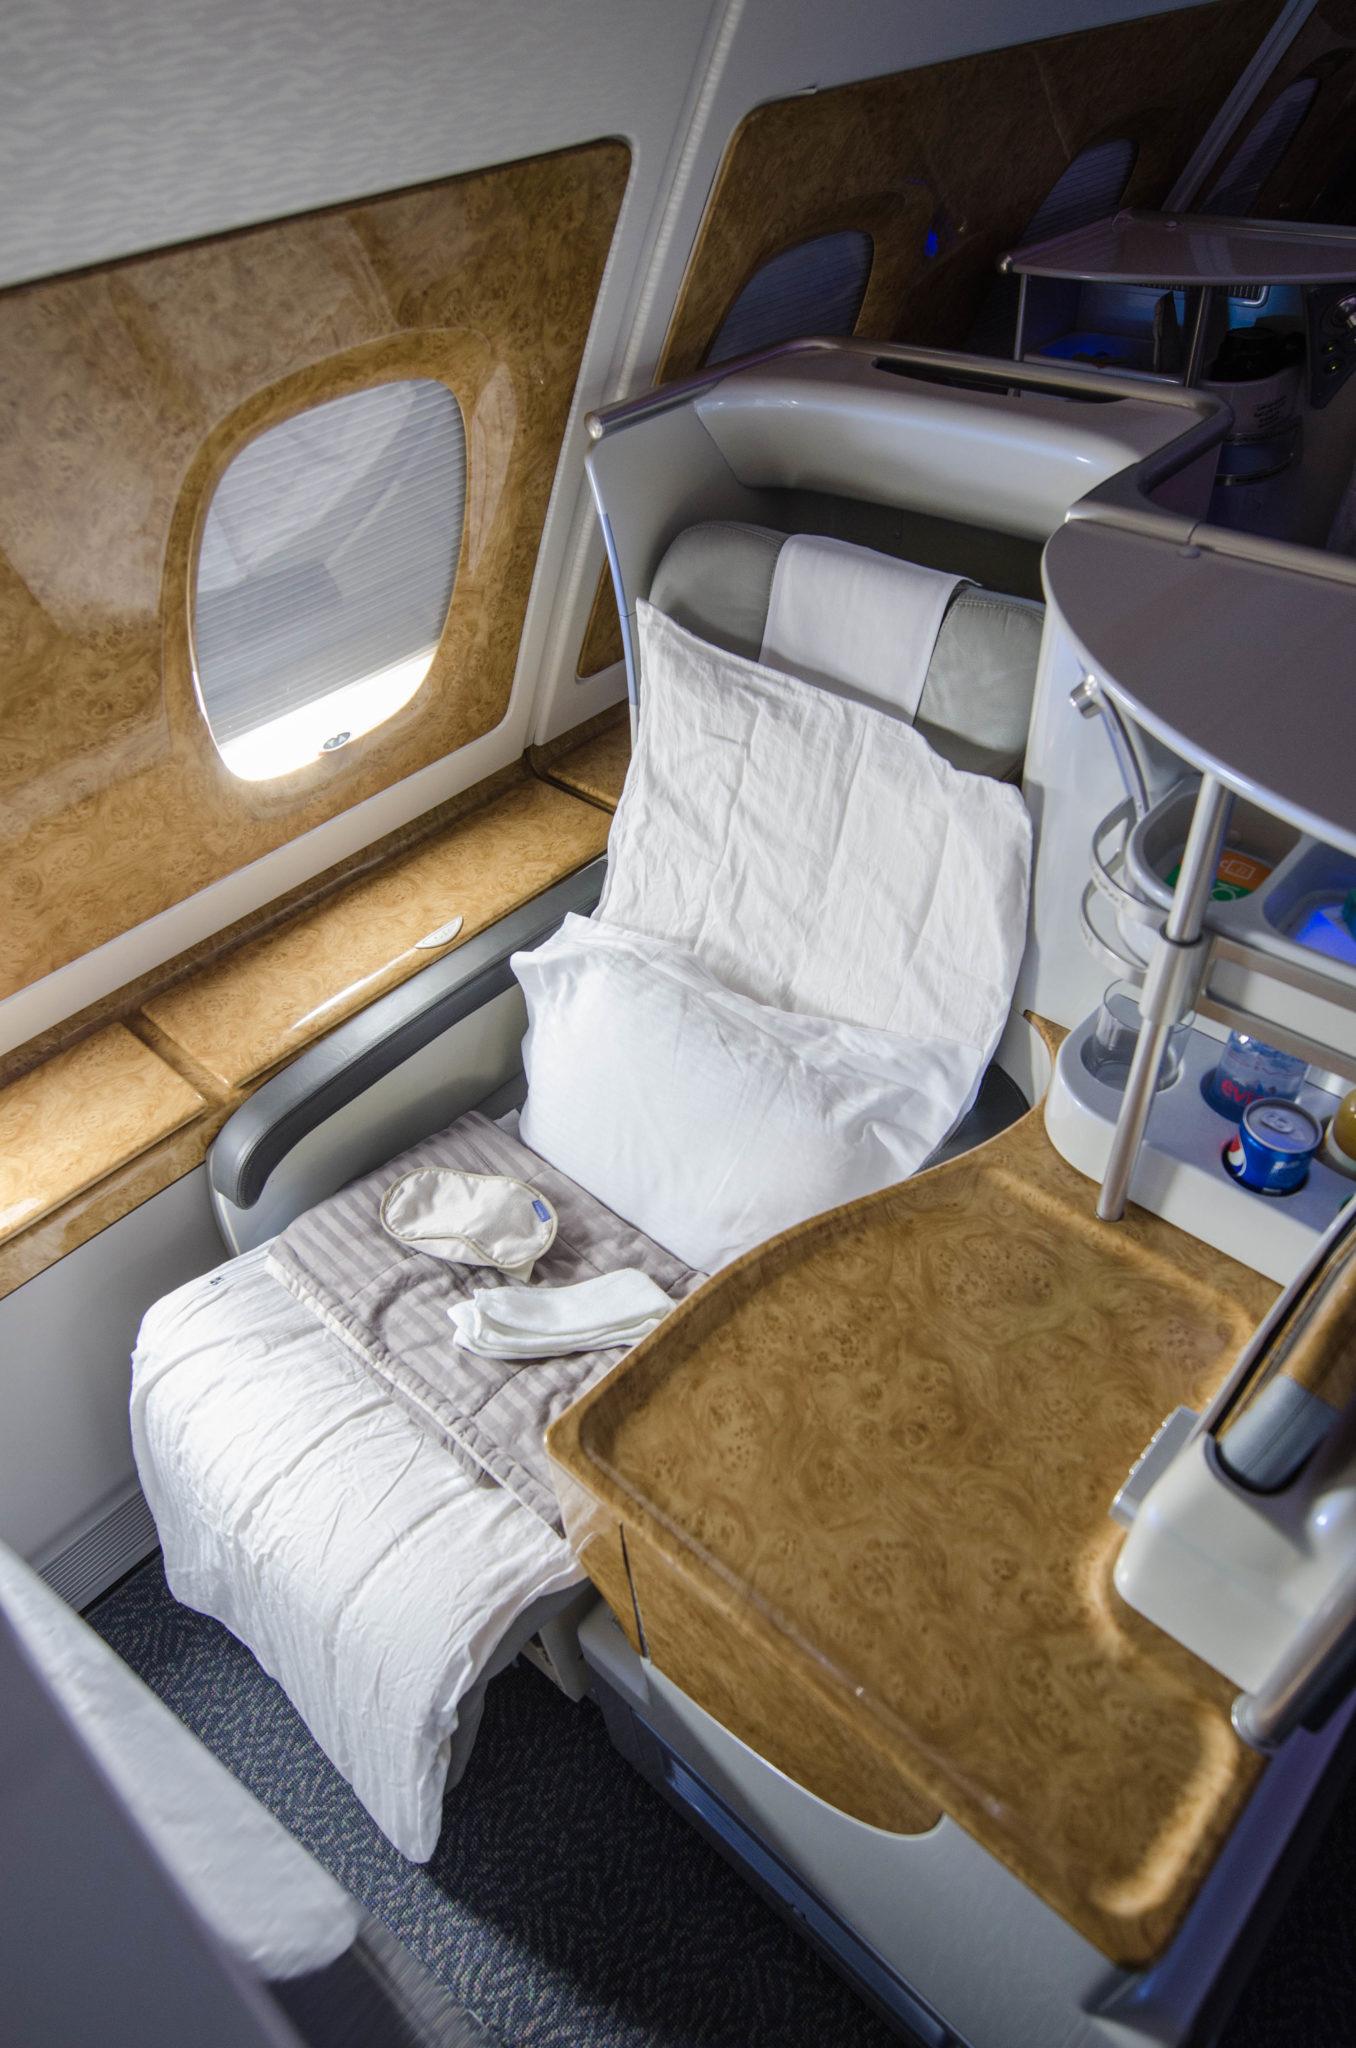 Der Emirates Business Class Sitz im A380 bietet jede Menge Platz